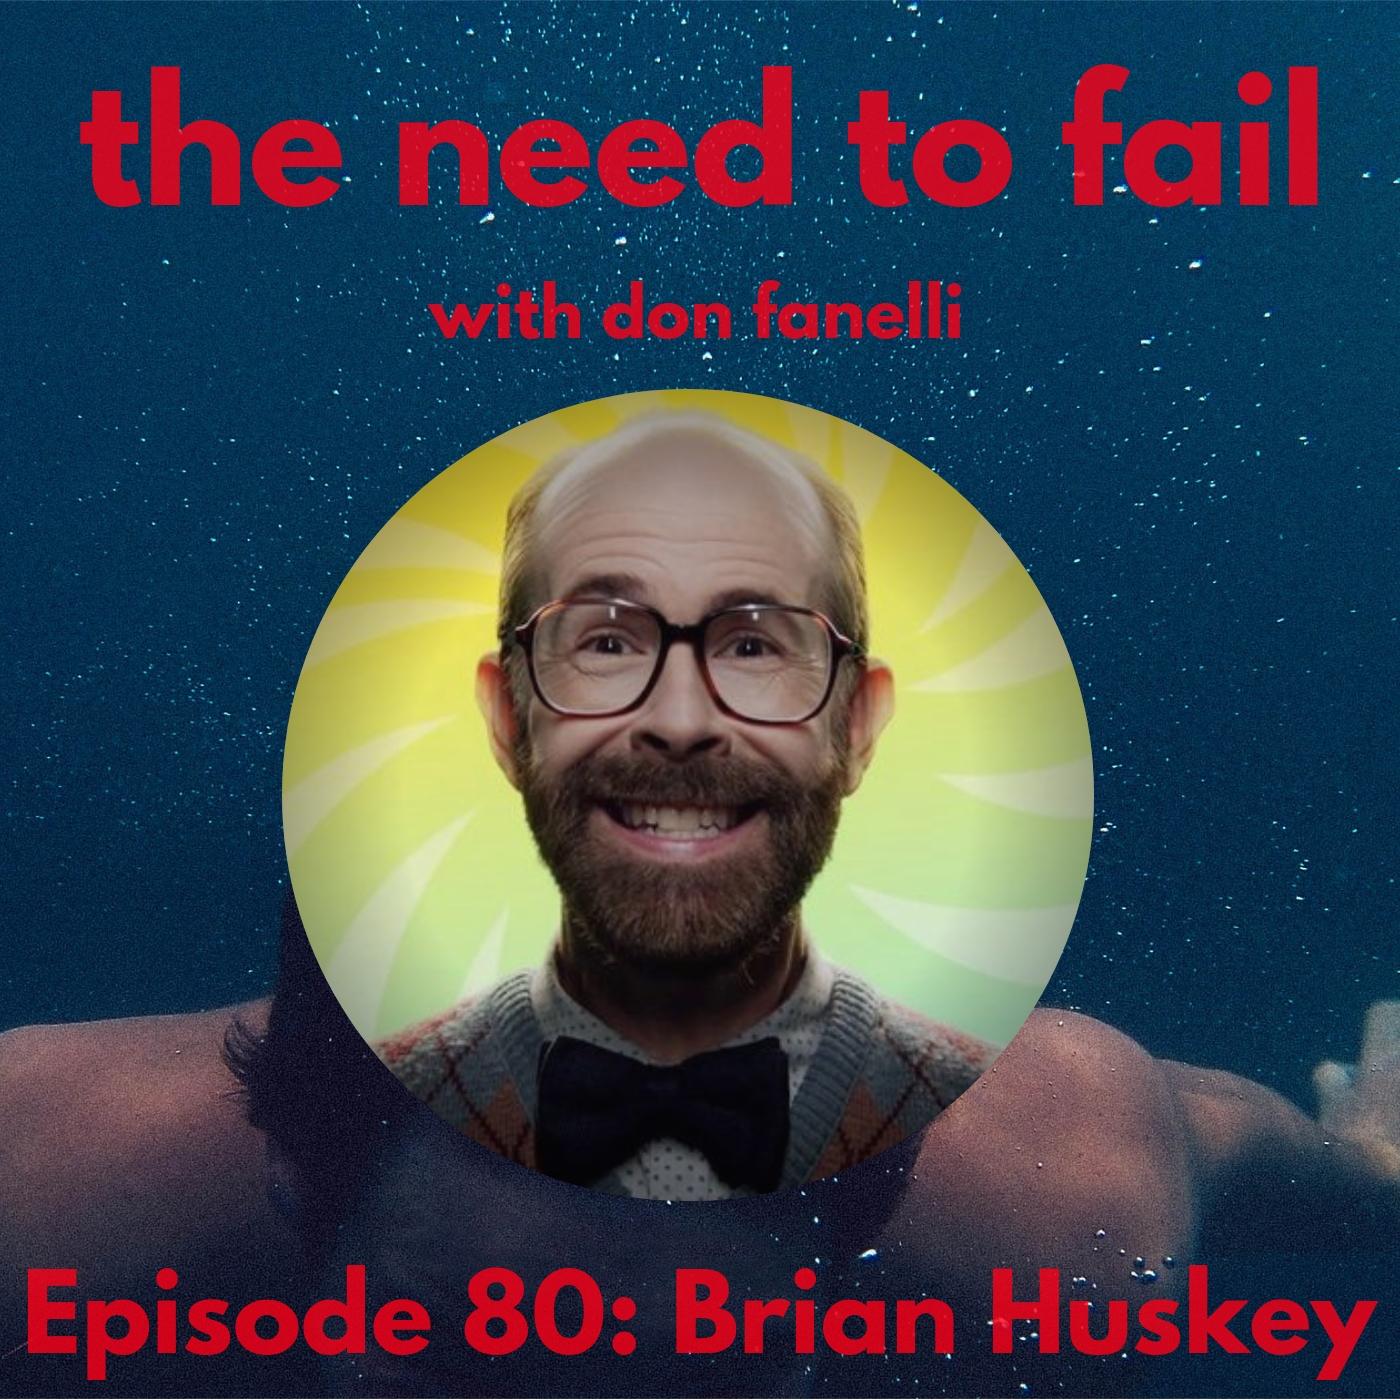 Episode 80: Brian Huskey